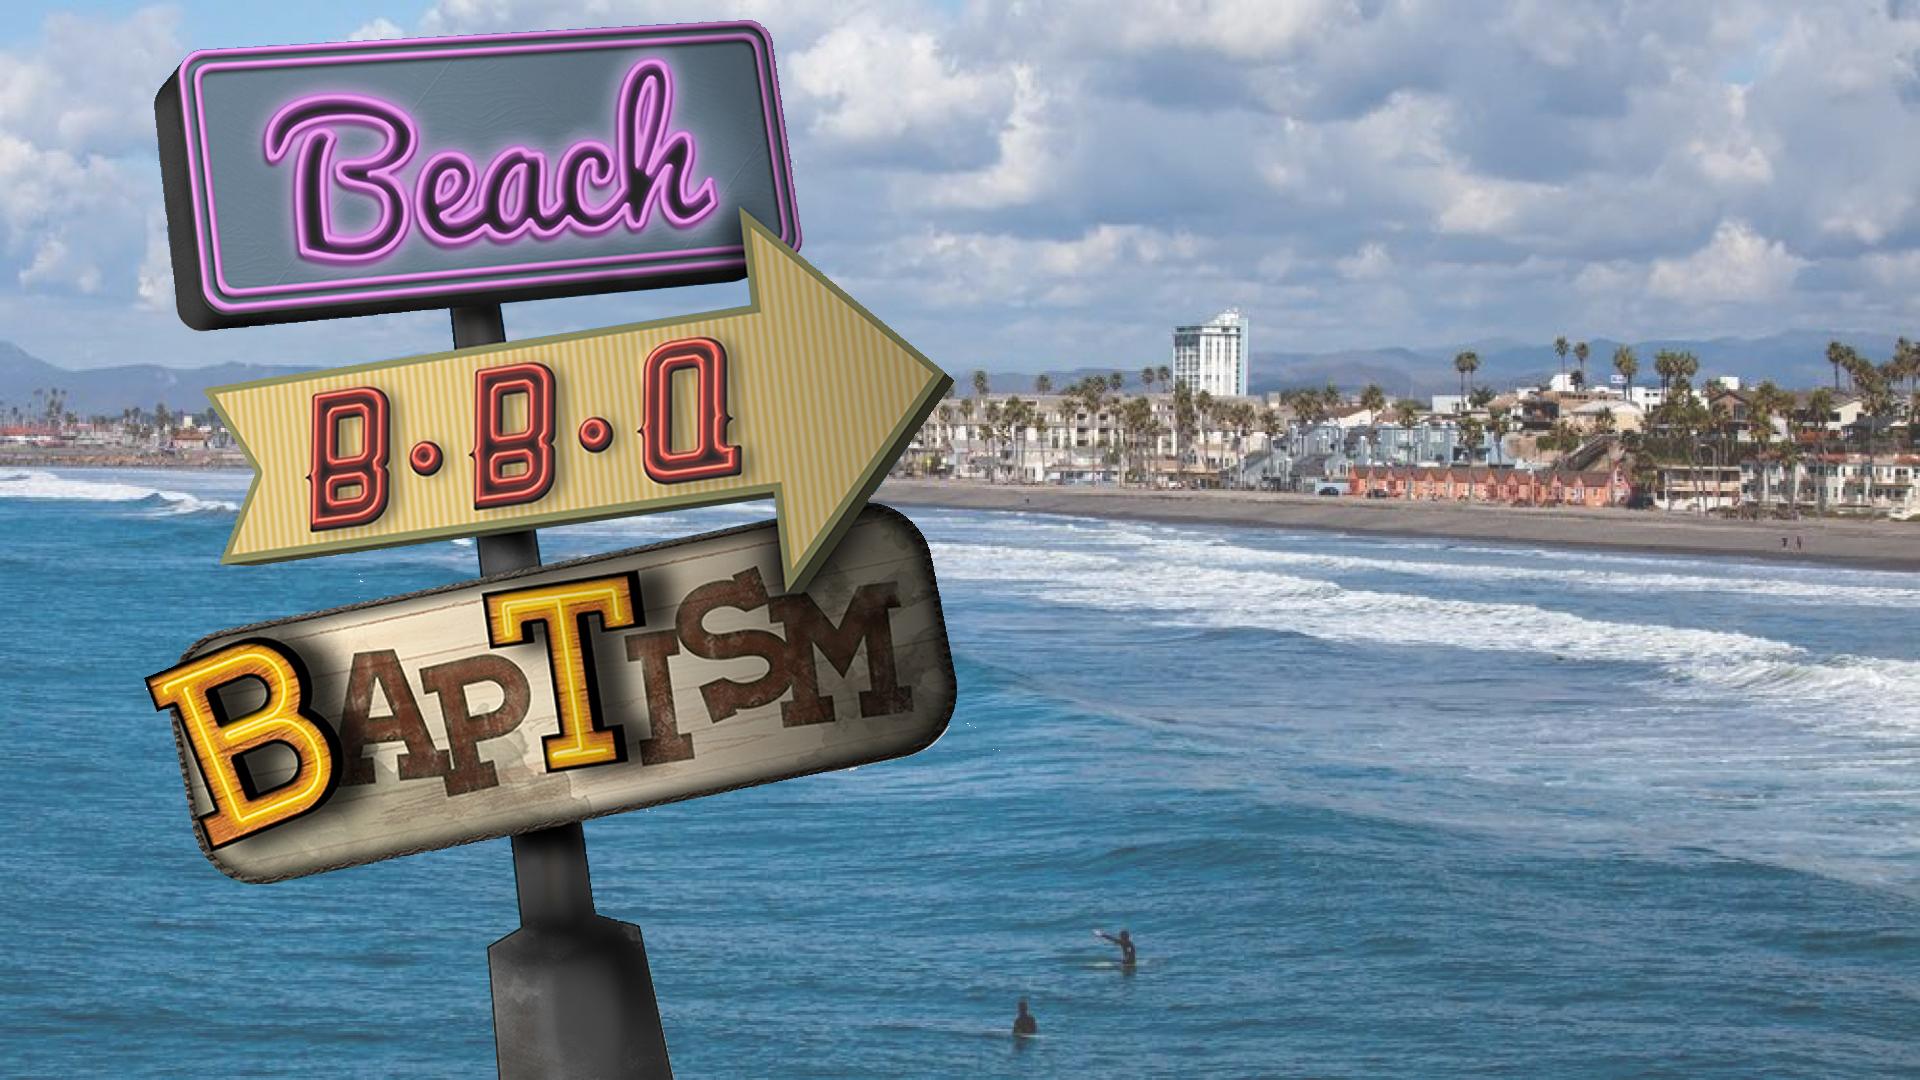 Beach BBQ Baptism 2018.jpg